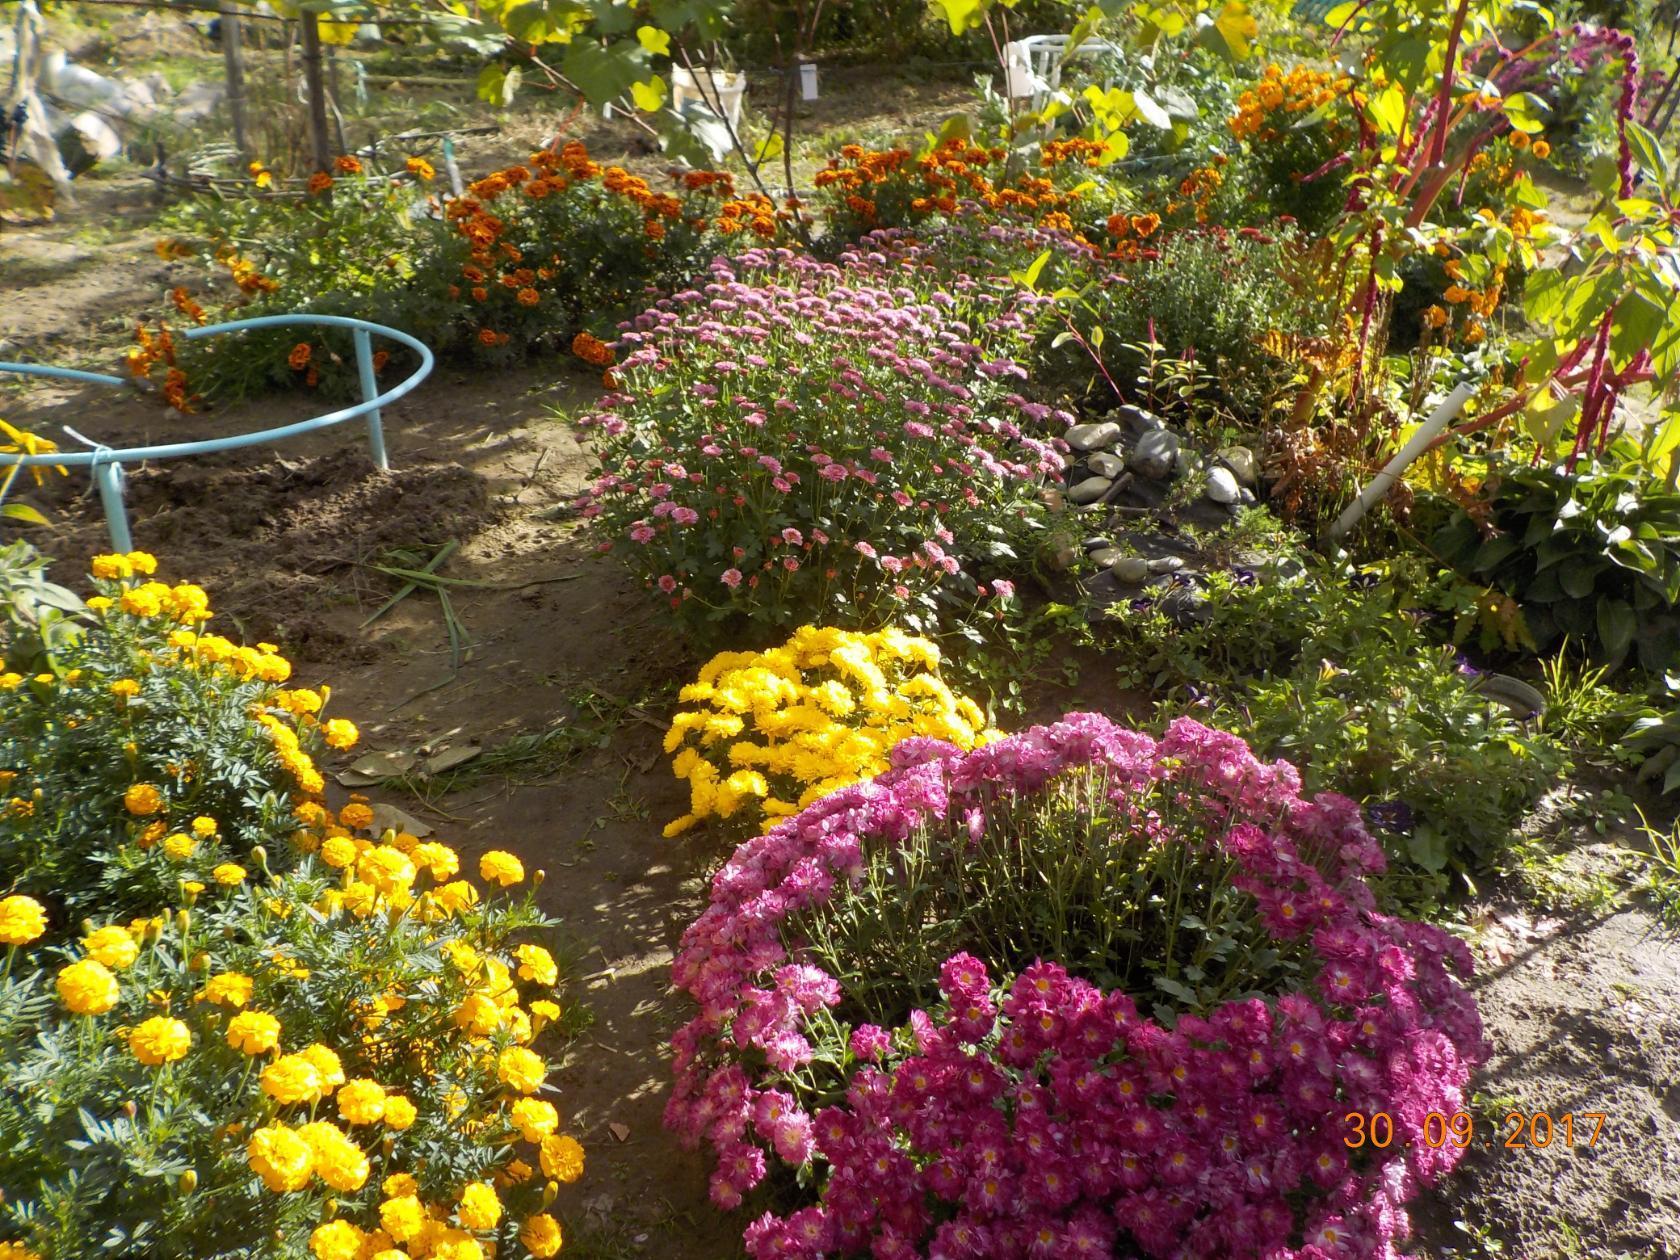 полисадник дача хобби цветы